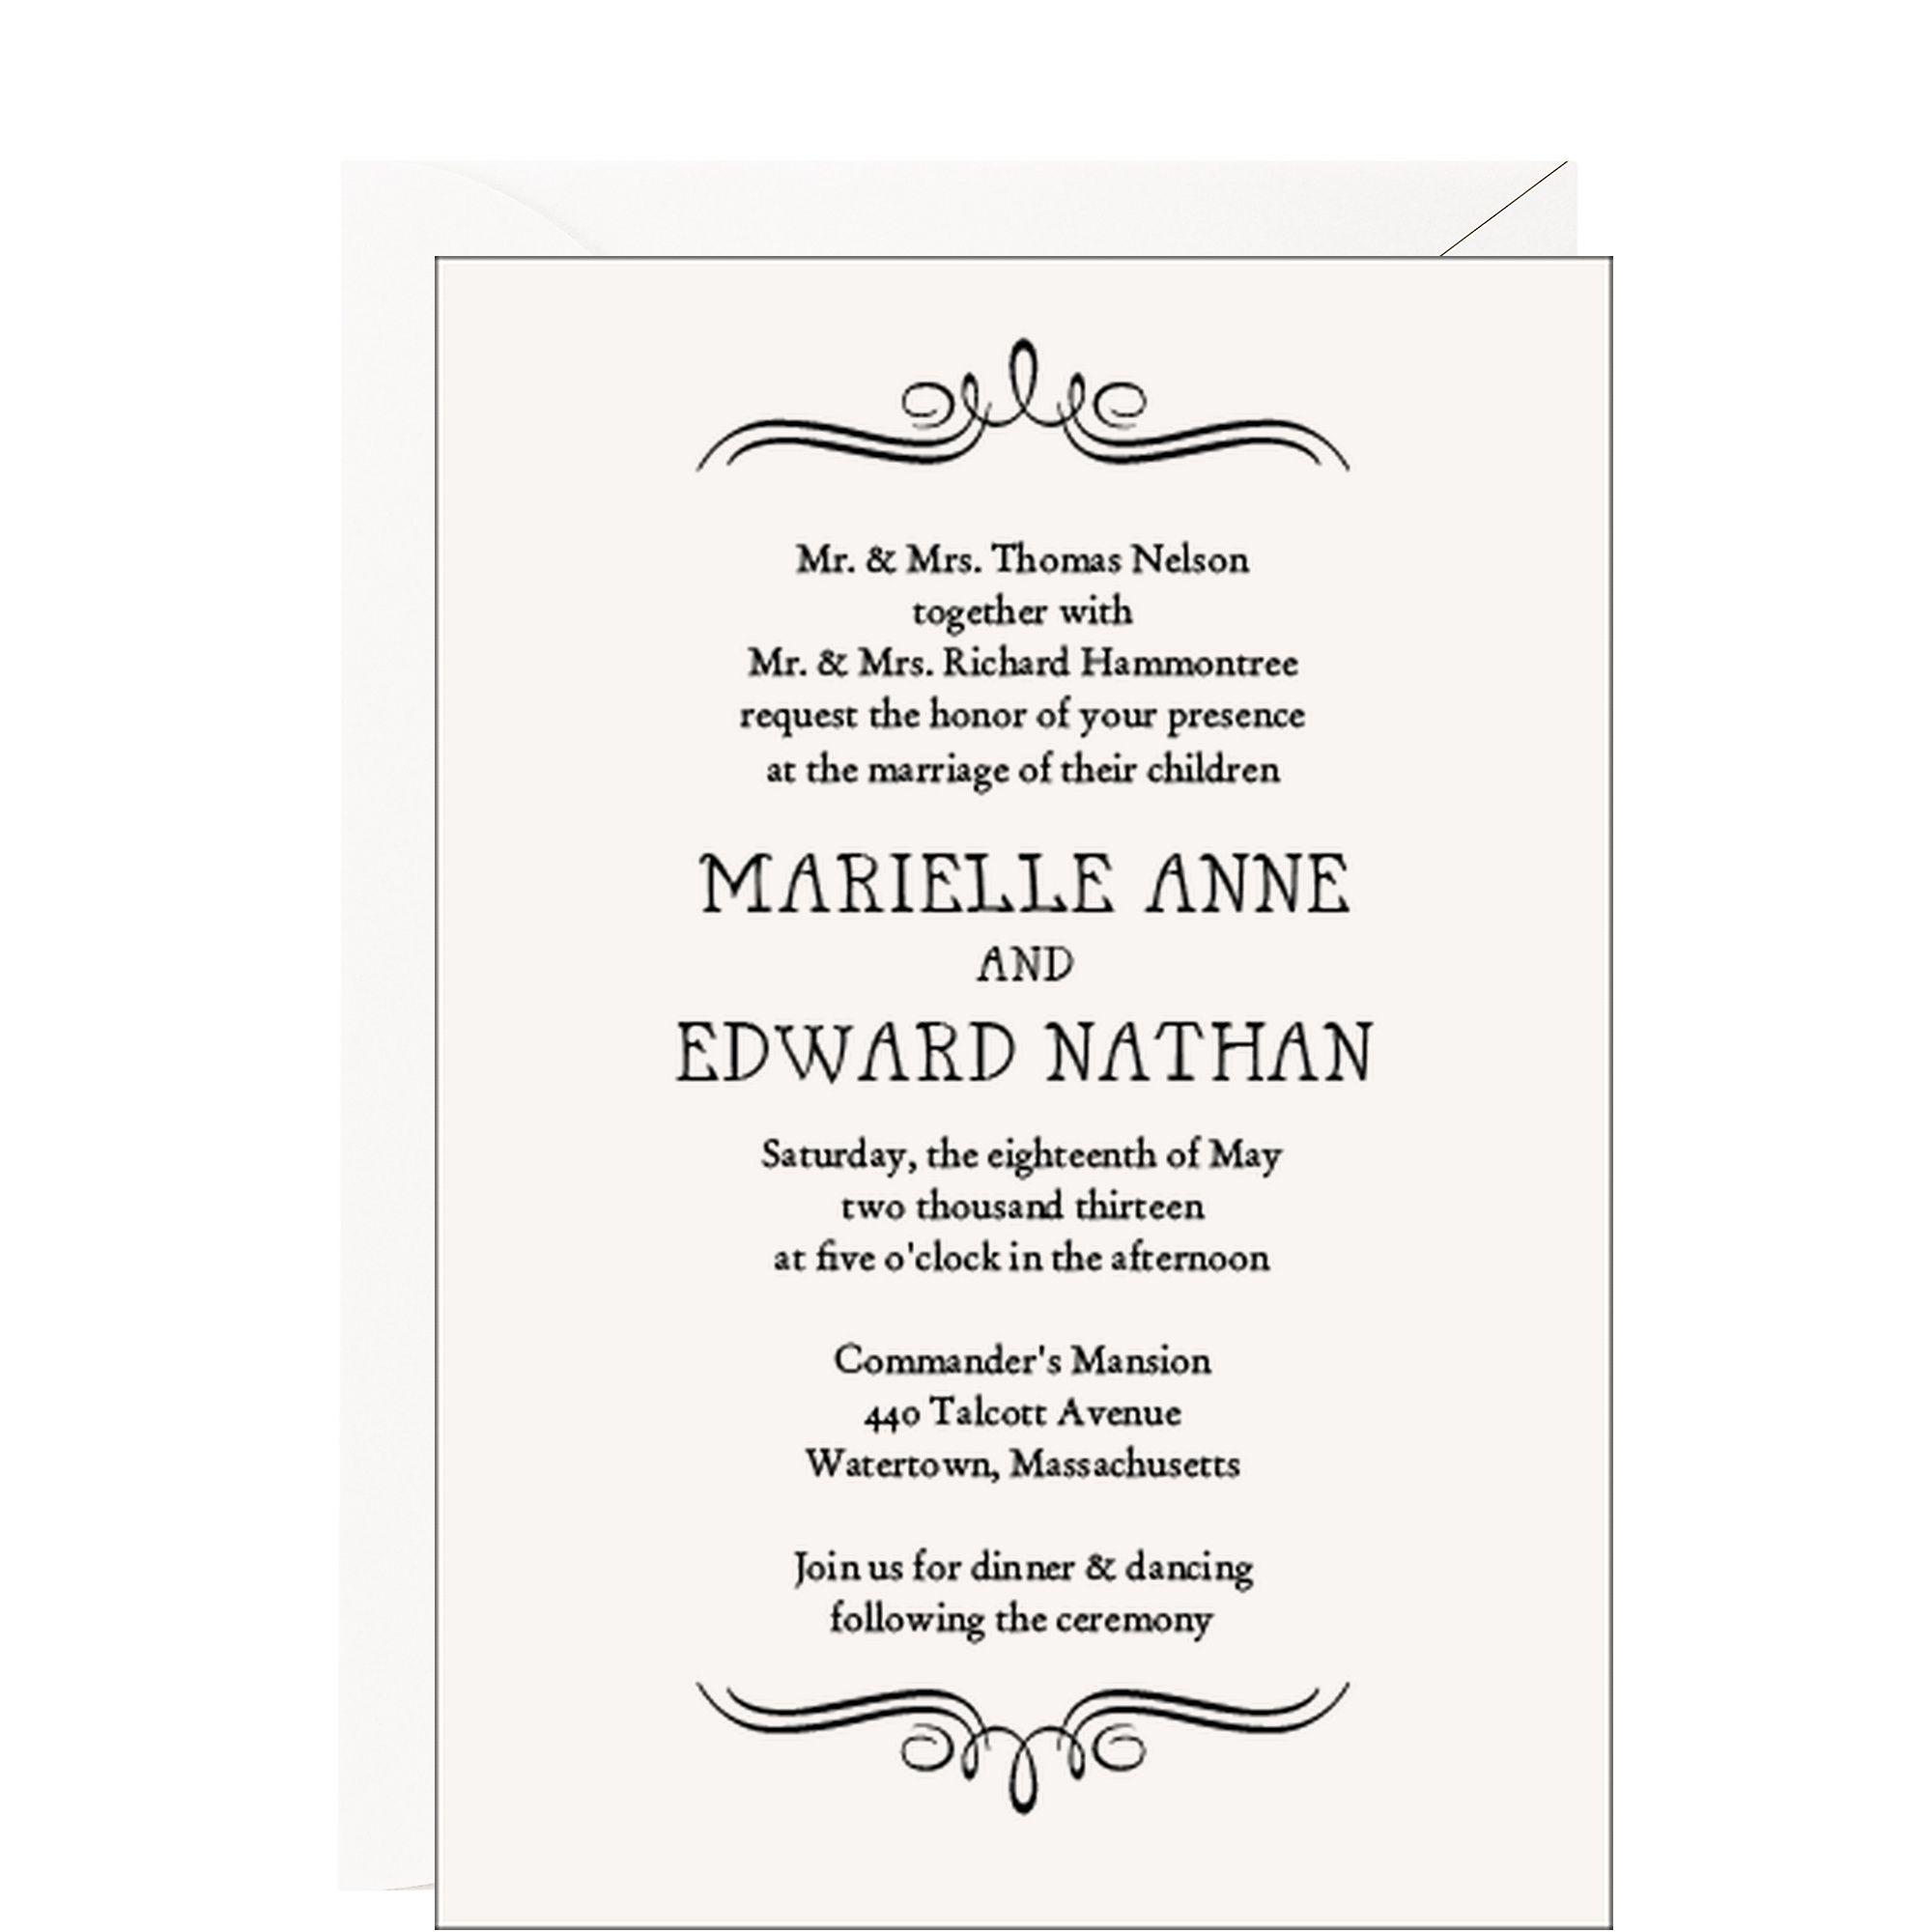 Vintage Marquis Wedding Invitation - Savoy Cotton Heavy | Wedding ...